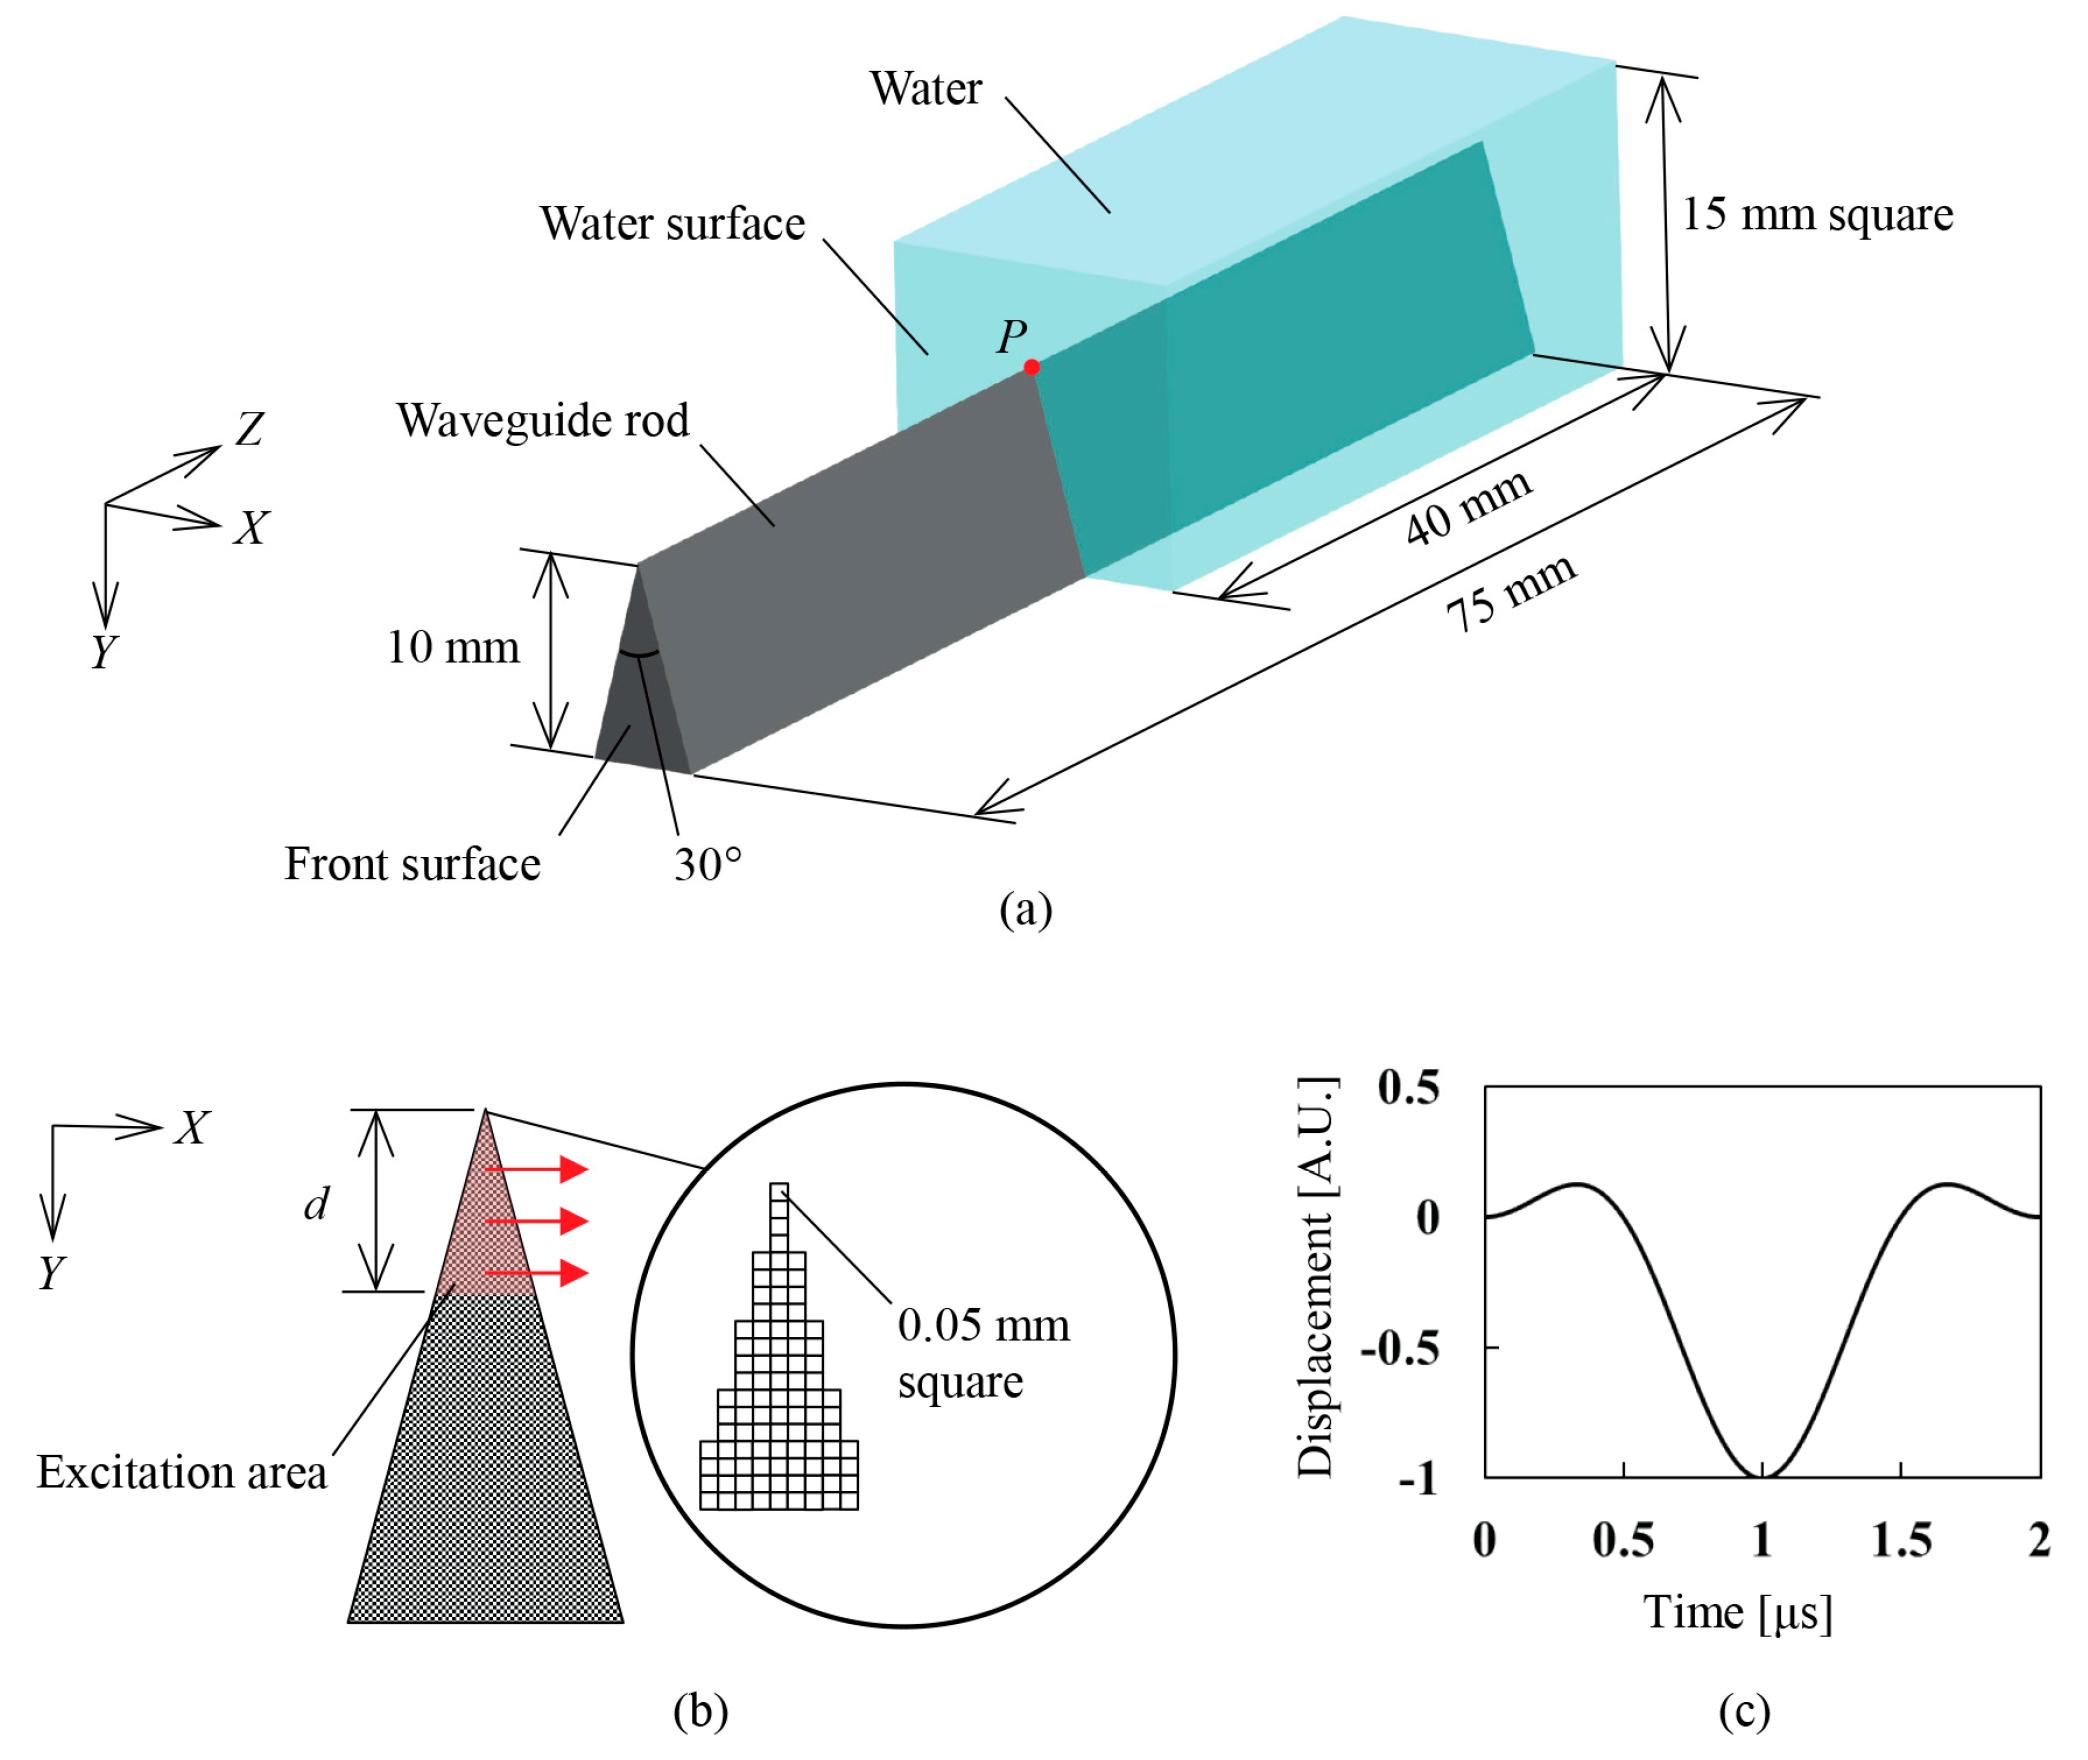 Sensors Free Full Text Measuring Liquid Level Utilizing Wedge Numeric Water Indicator Sensor Circuit 18 00002 G002